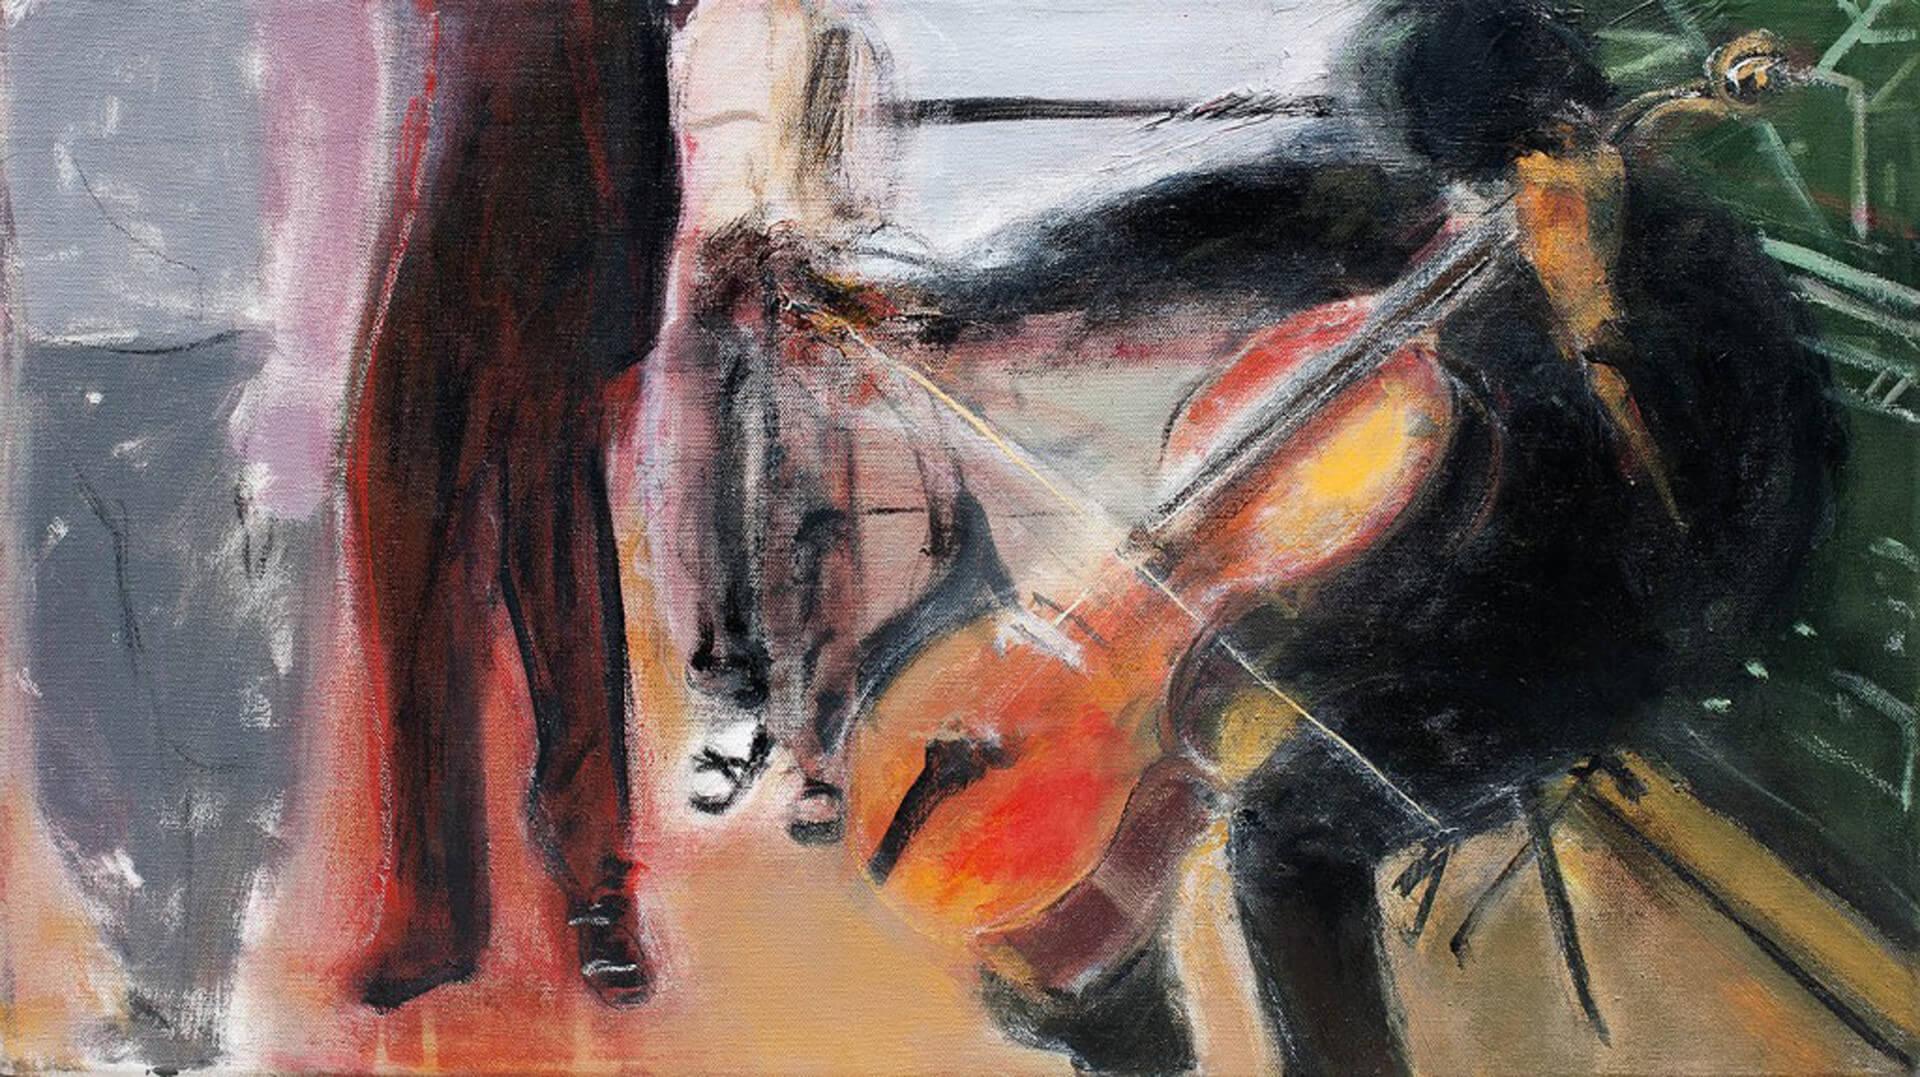 2012 - Mixed media on canvas. 40 cm. x 70 cm.